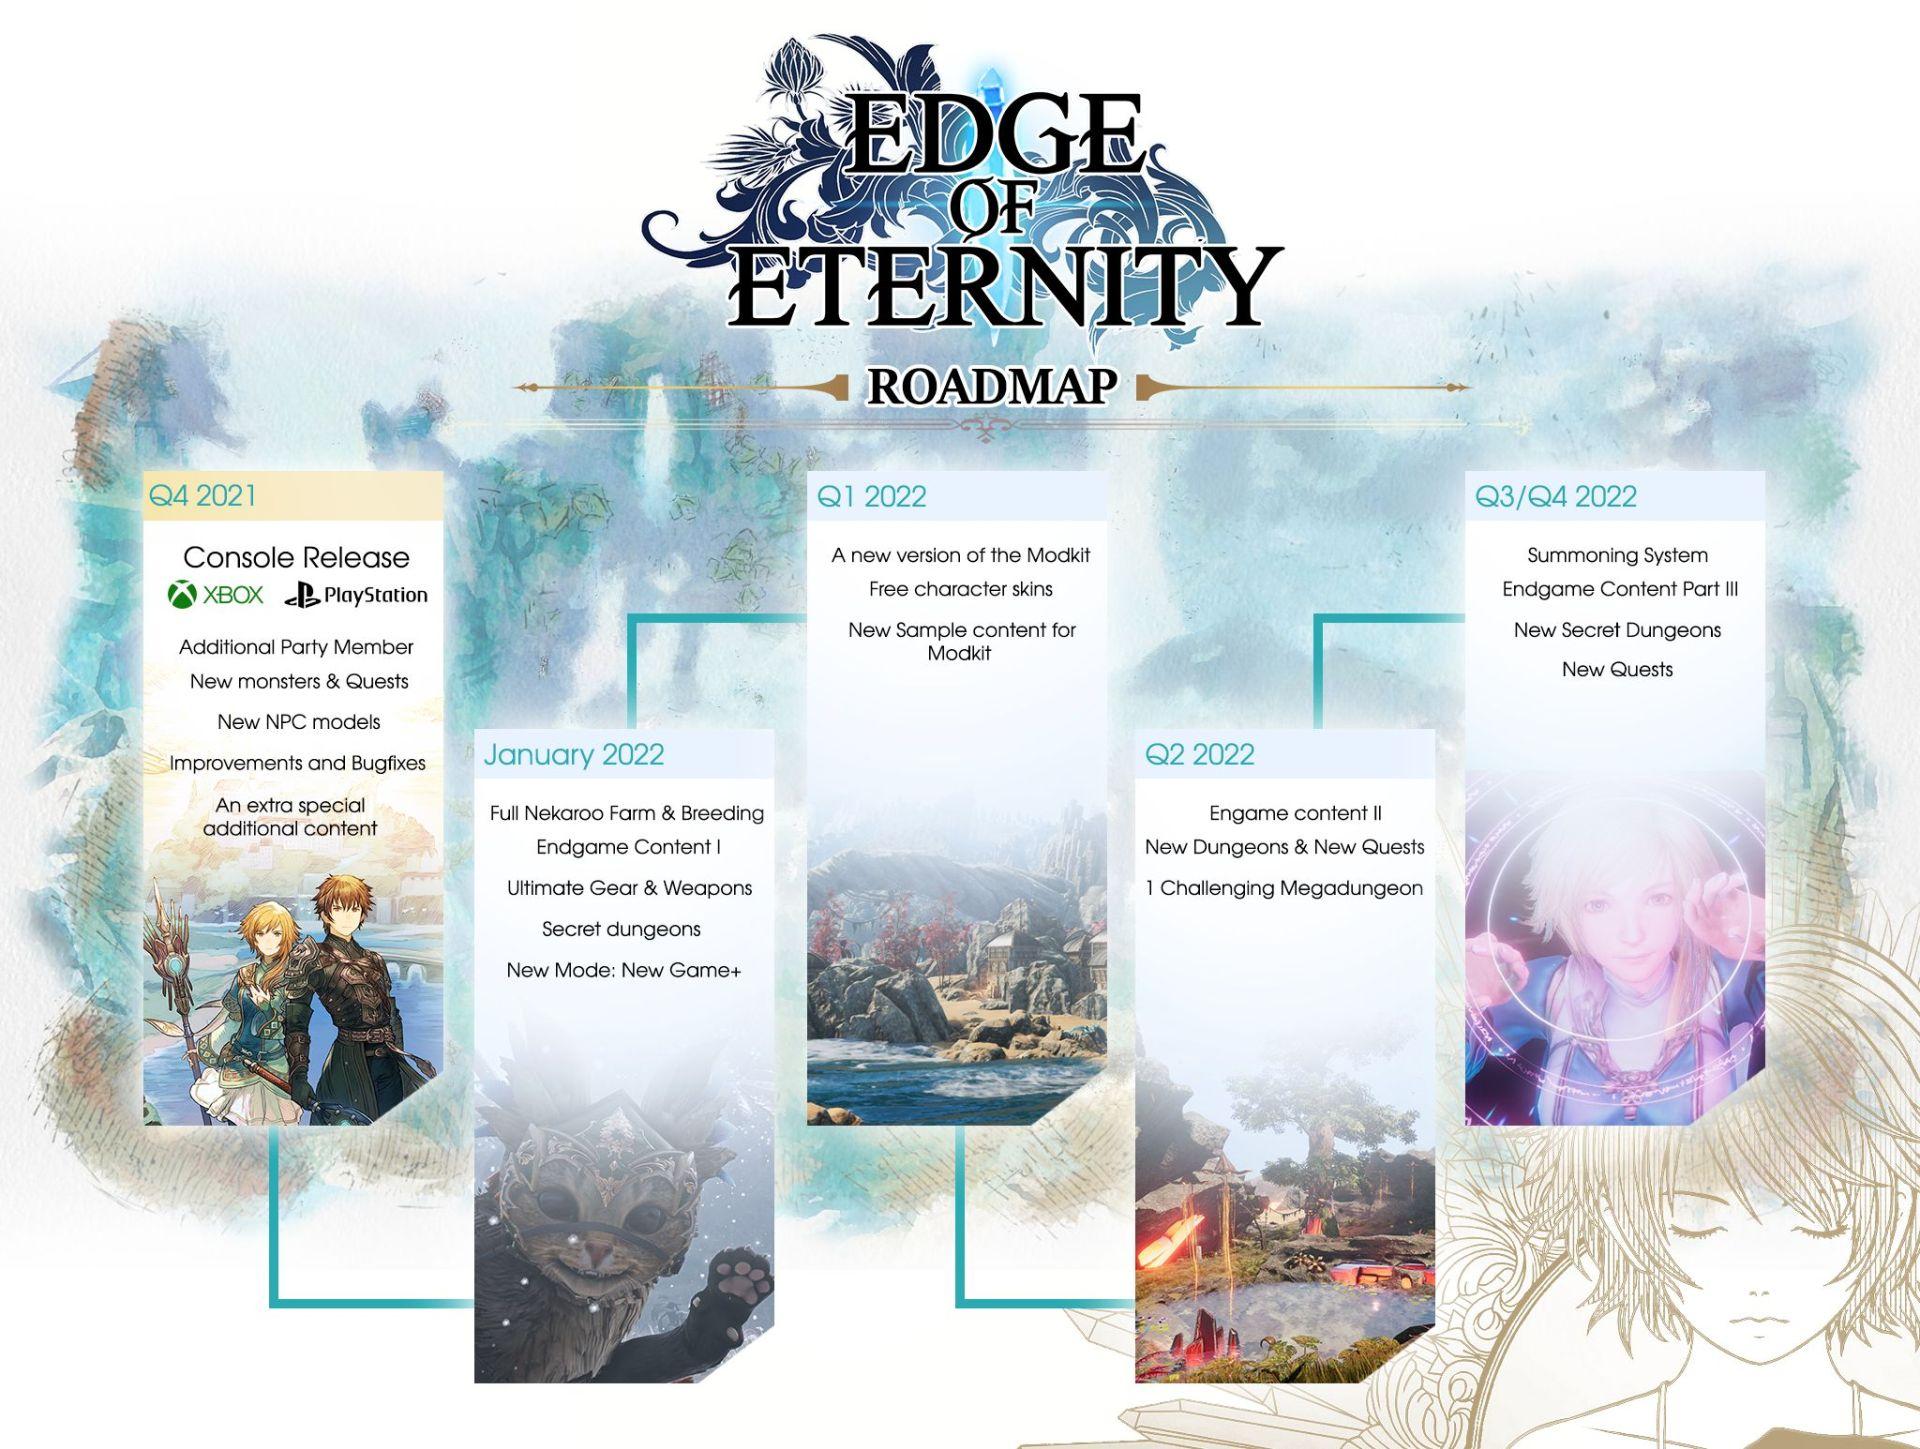 Edge of Eternity roadmap